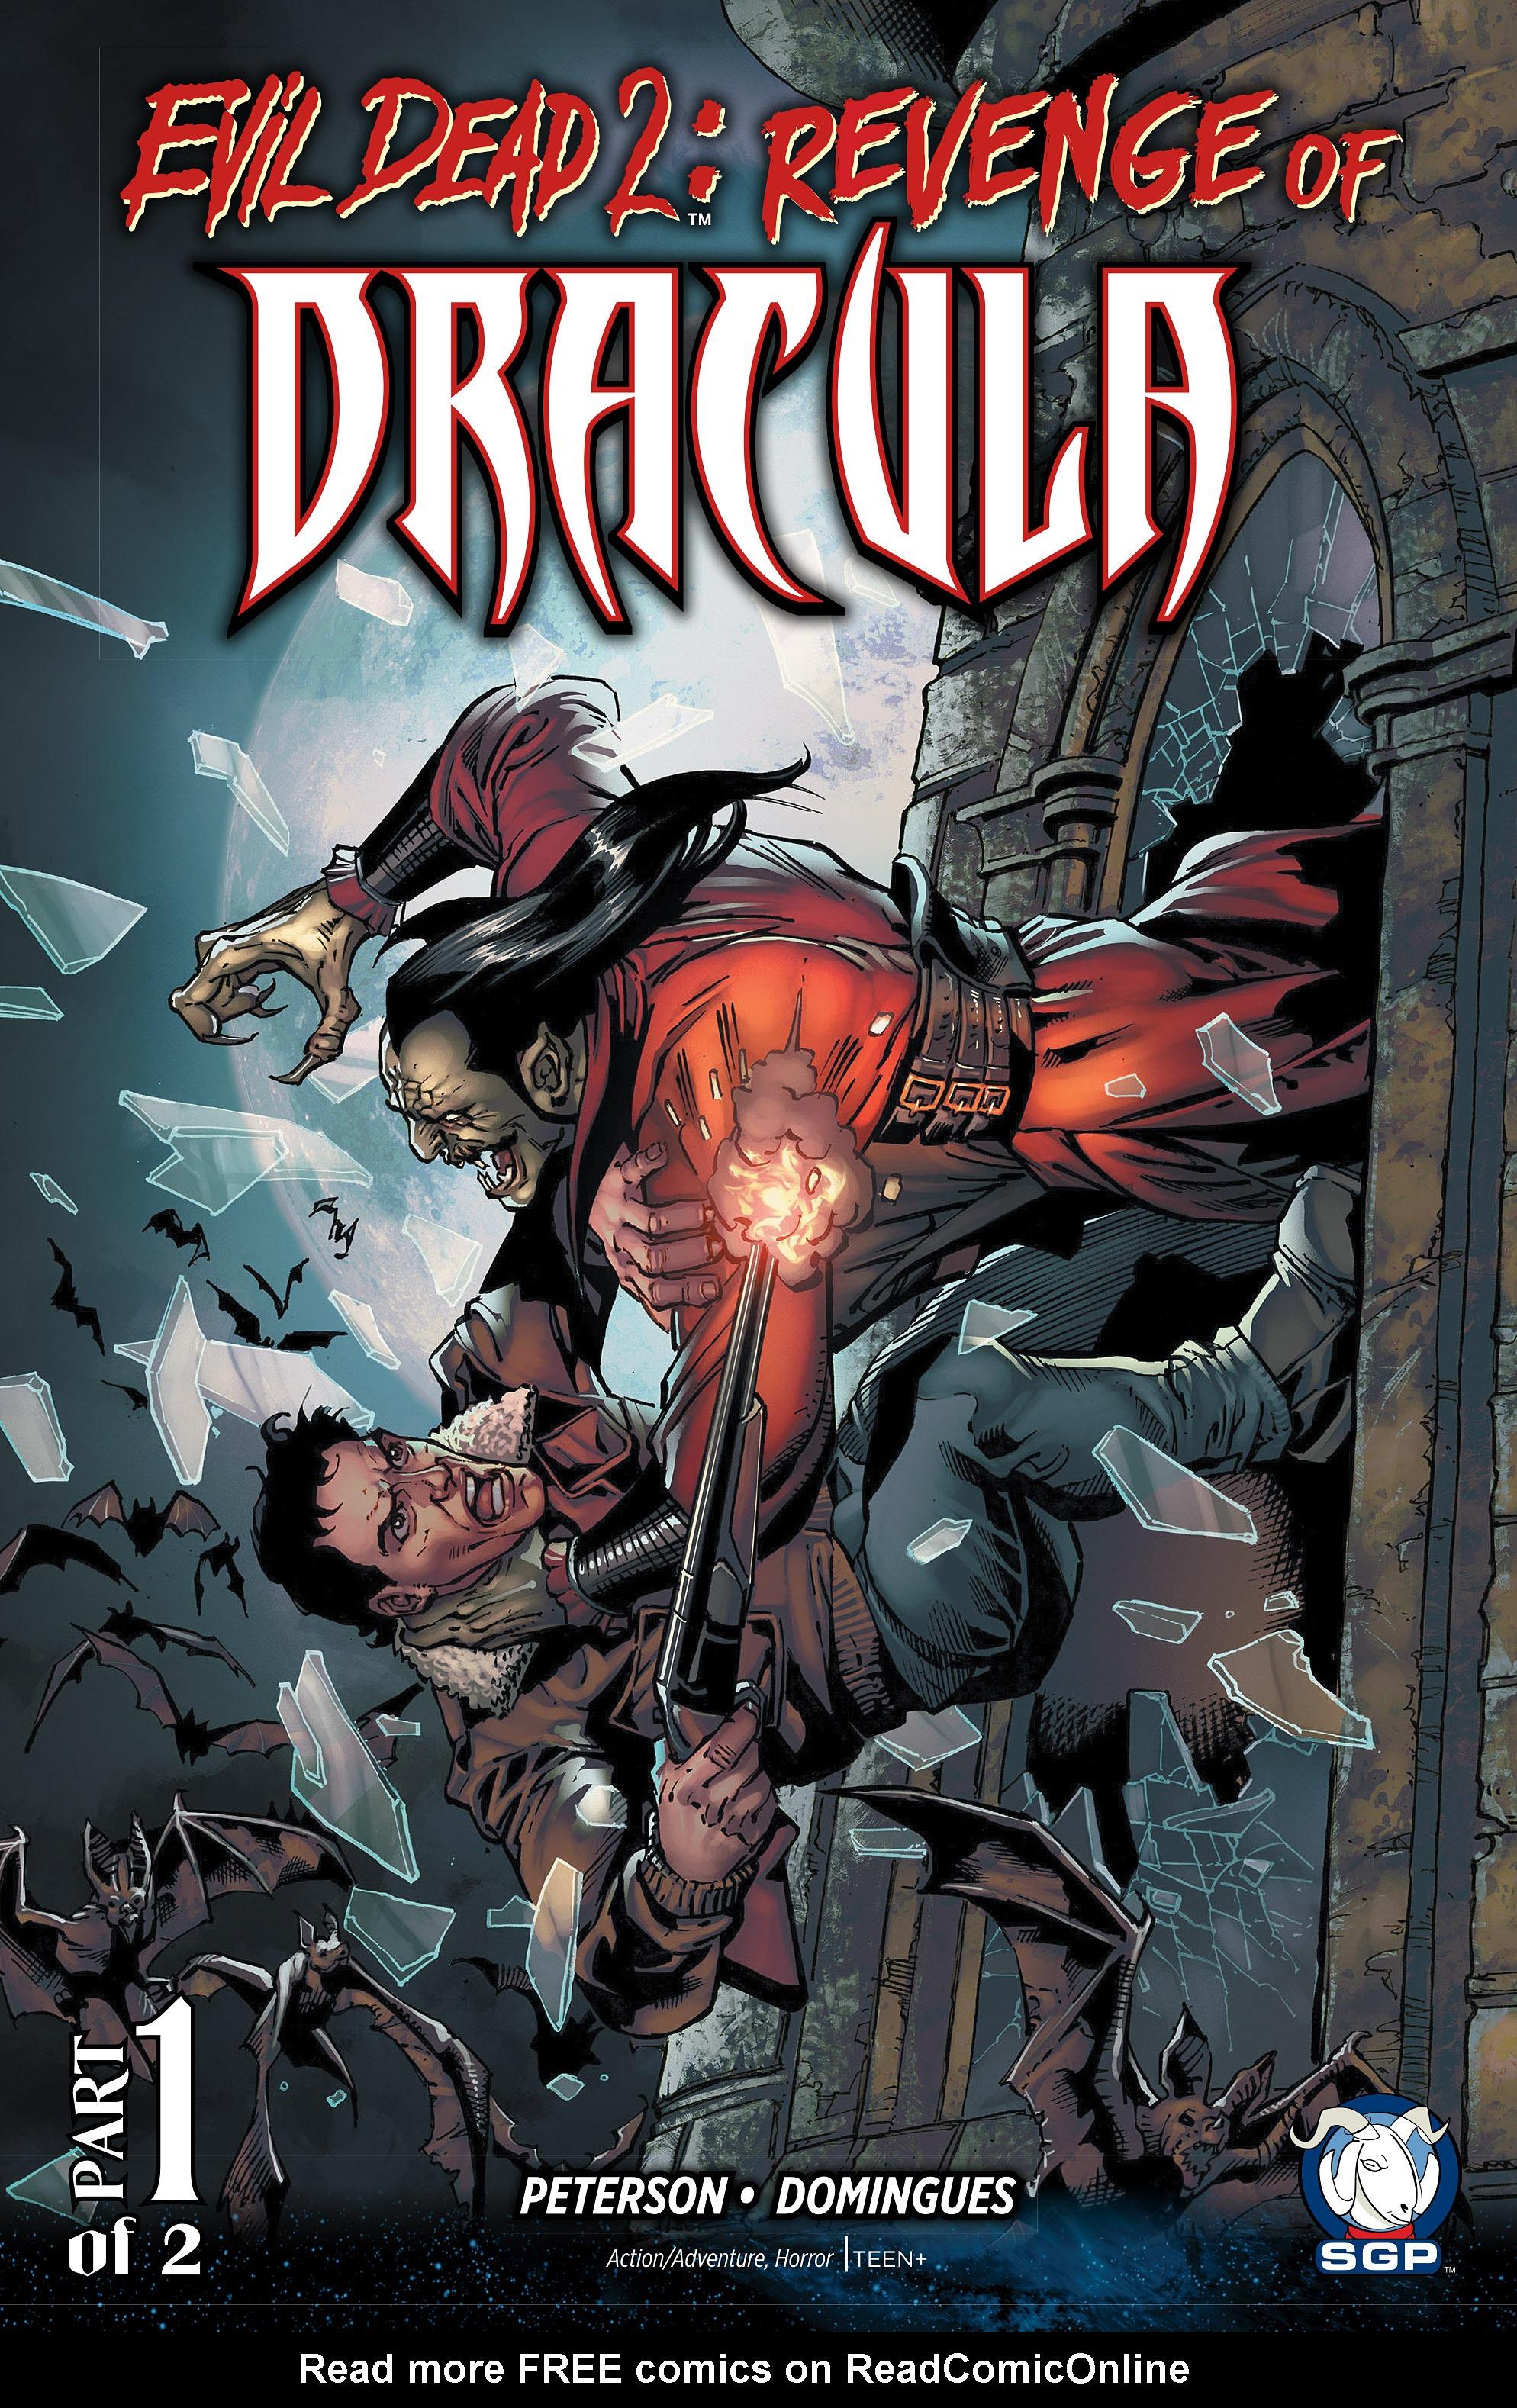 Evil Dead 2: Revenge of Dracula 1 Page 1